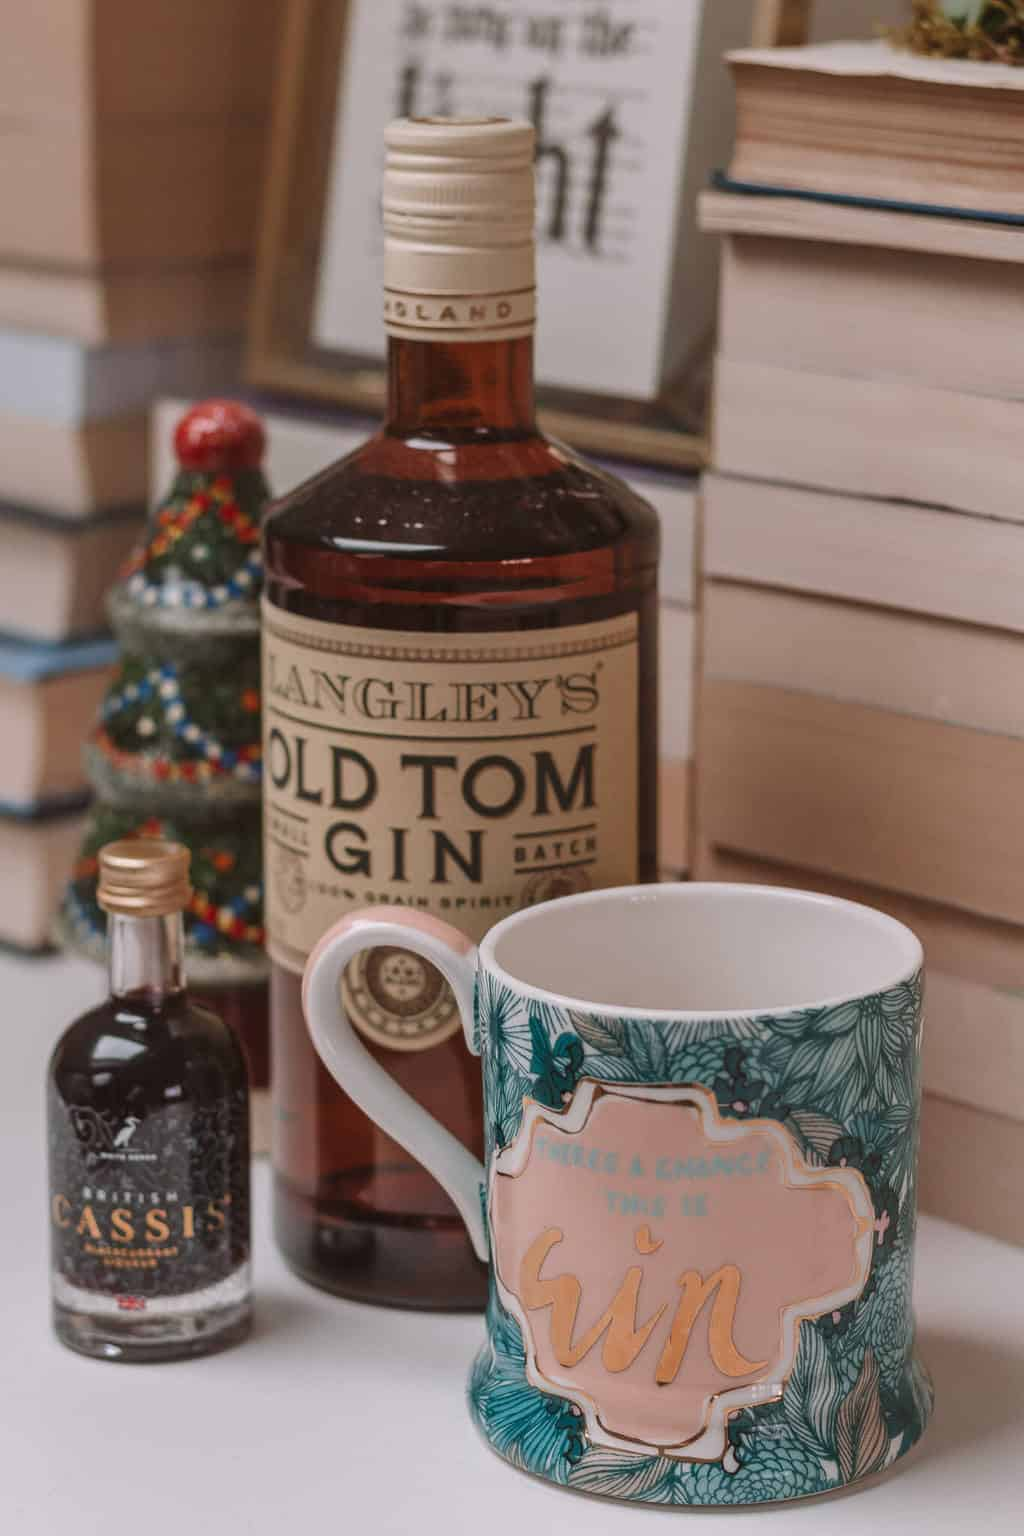 Gin Mug - Christmas Gift Guide 2018: Brilliant Christmas Gift Ideas For Her #whatshotblog